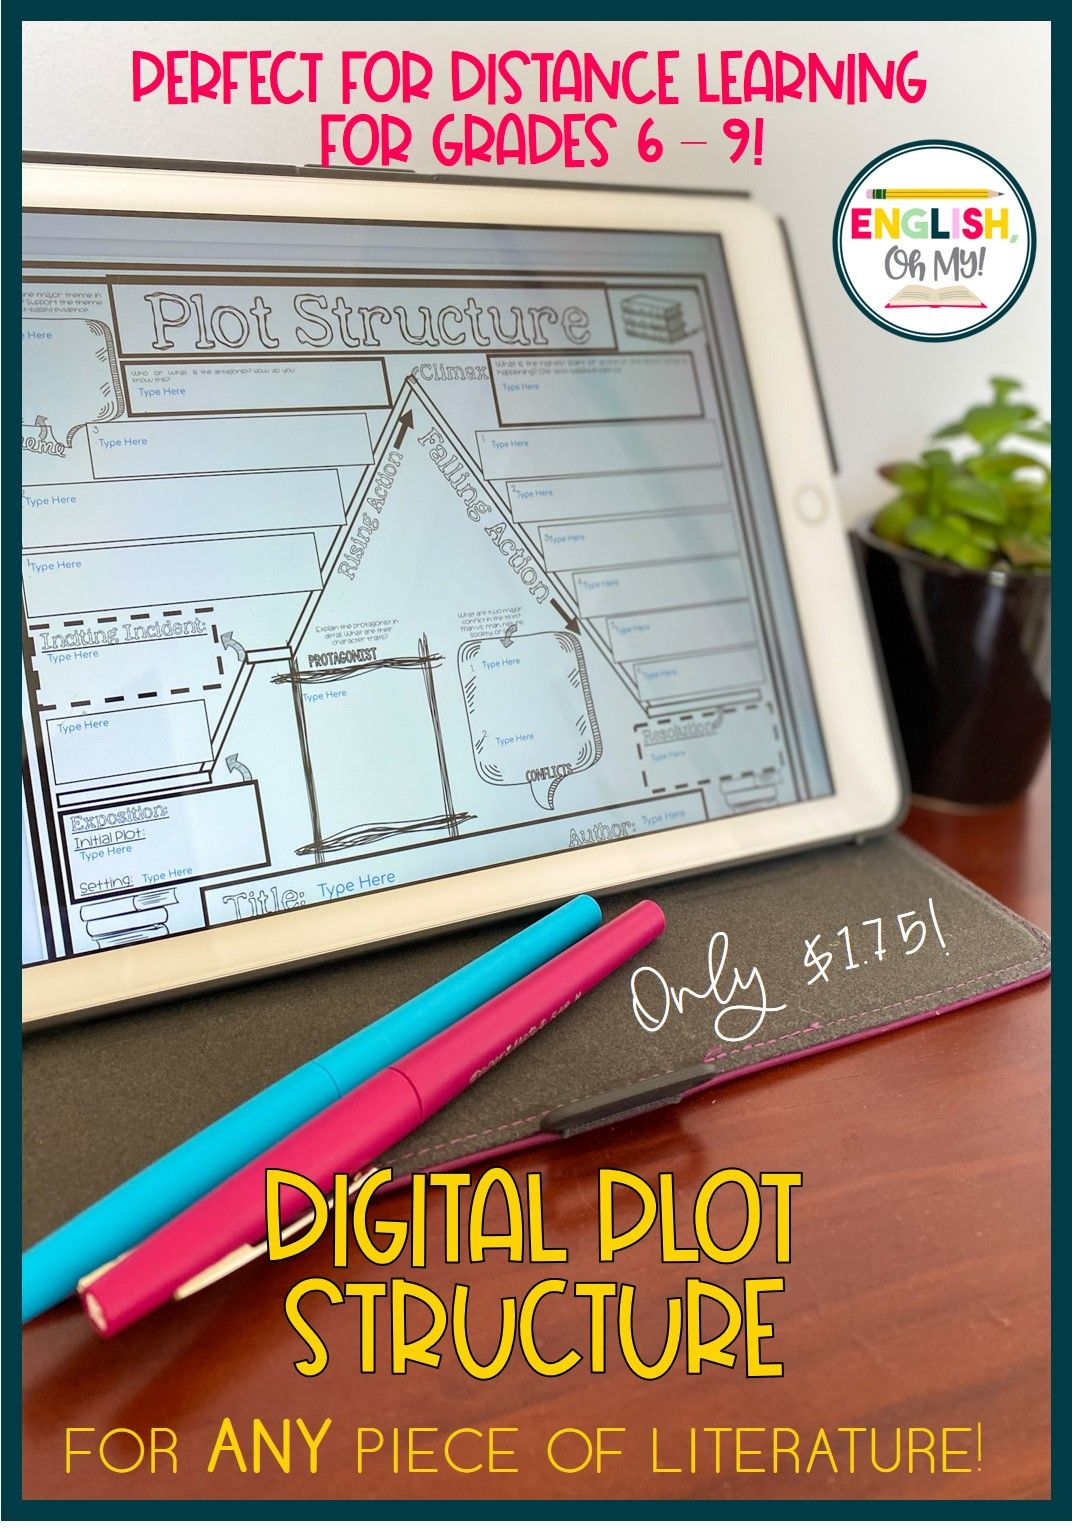 Digital Plot Structure